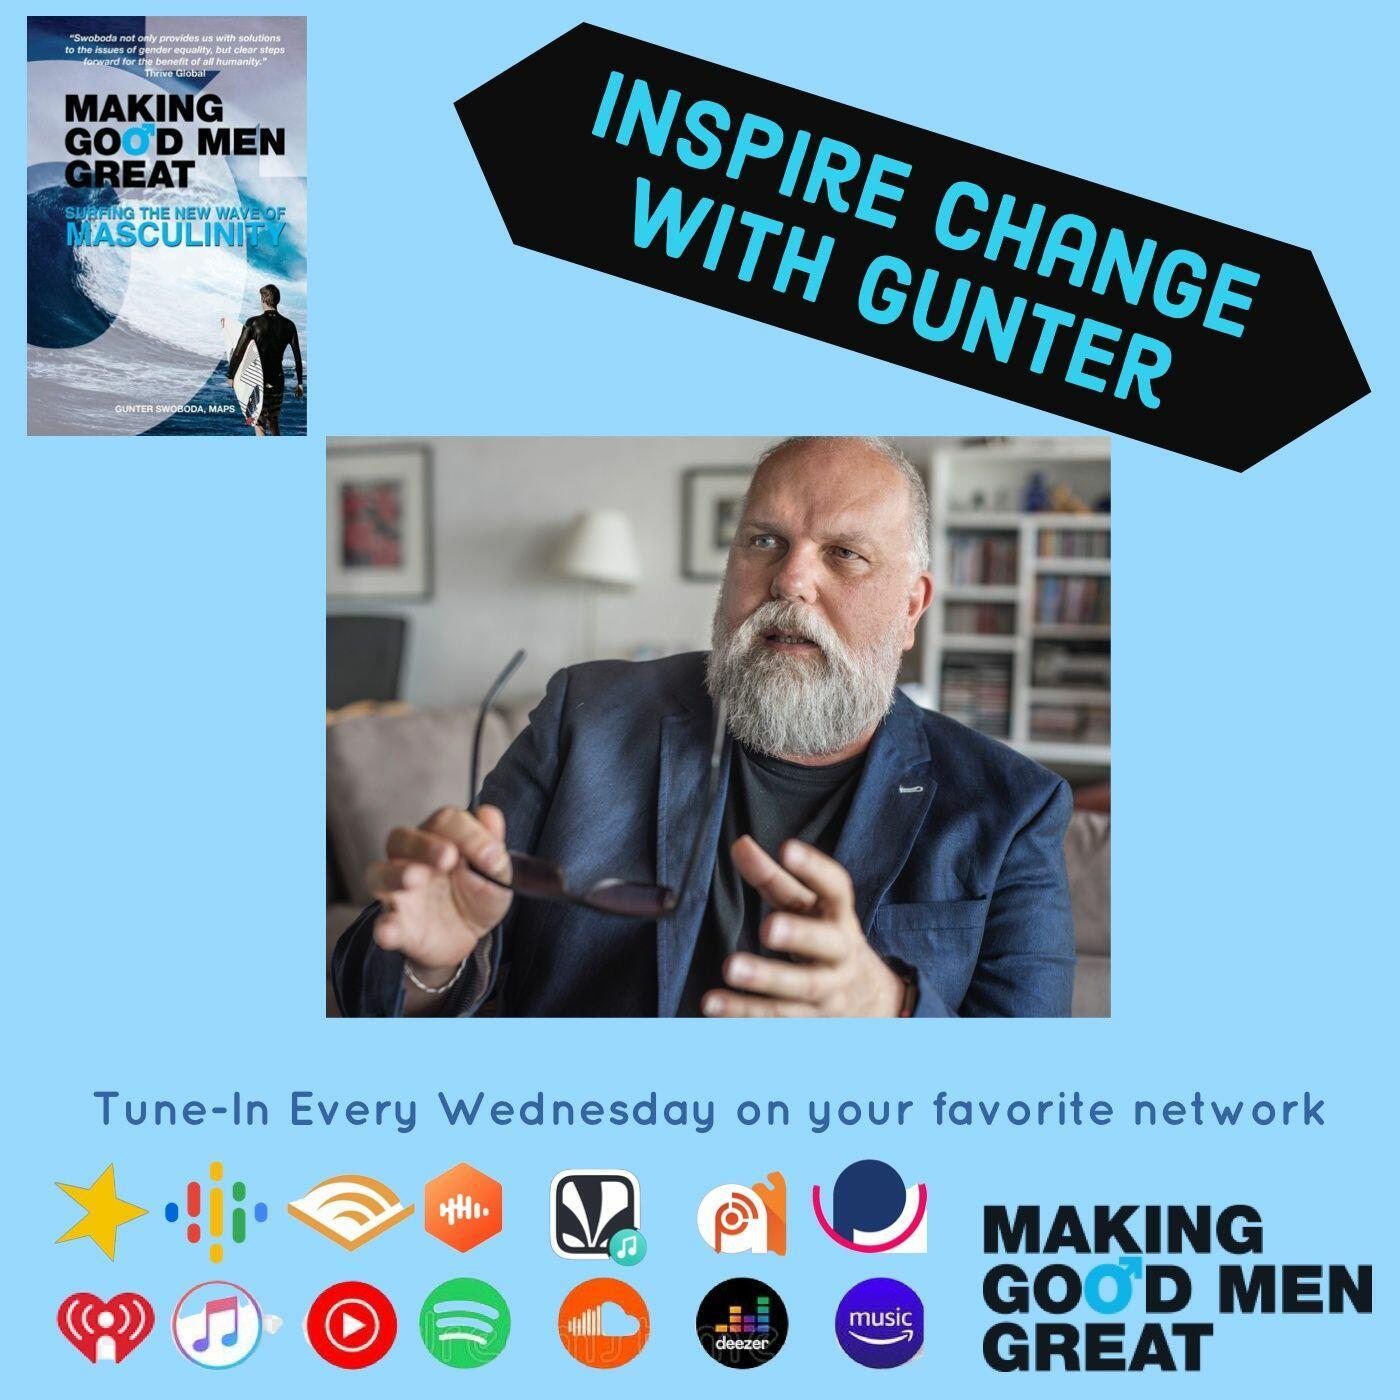 Inspire Change with Gunter